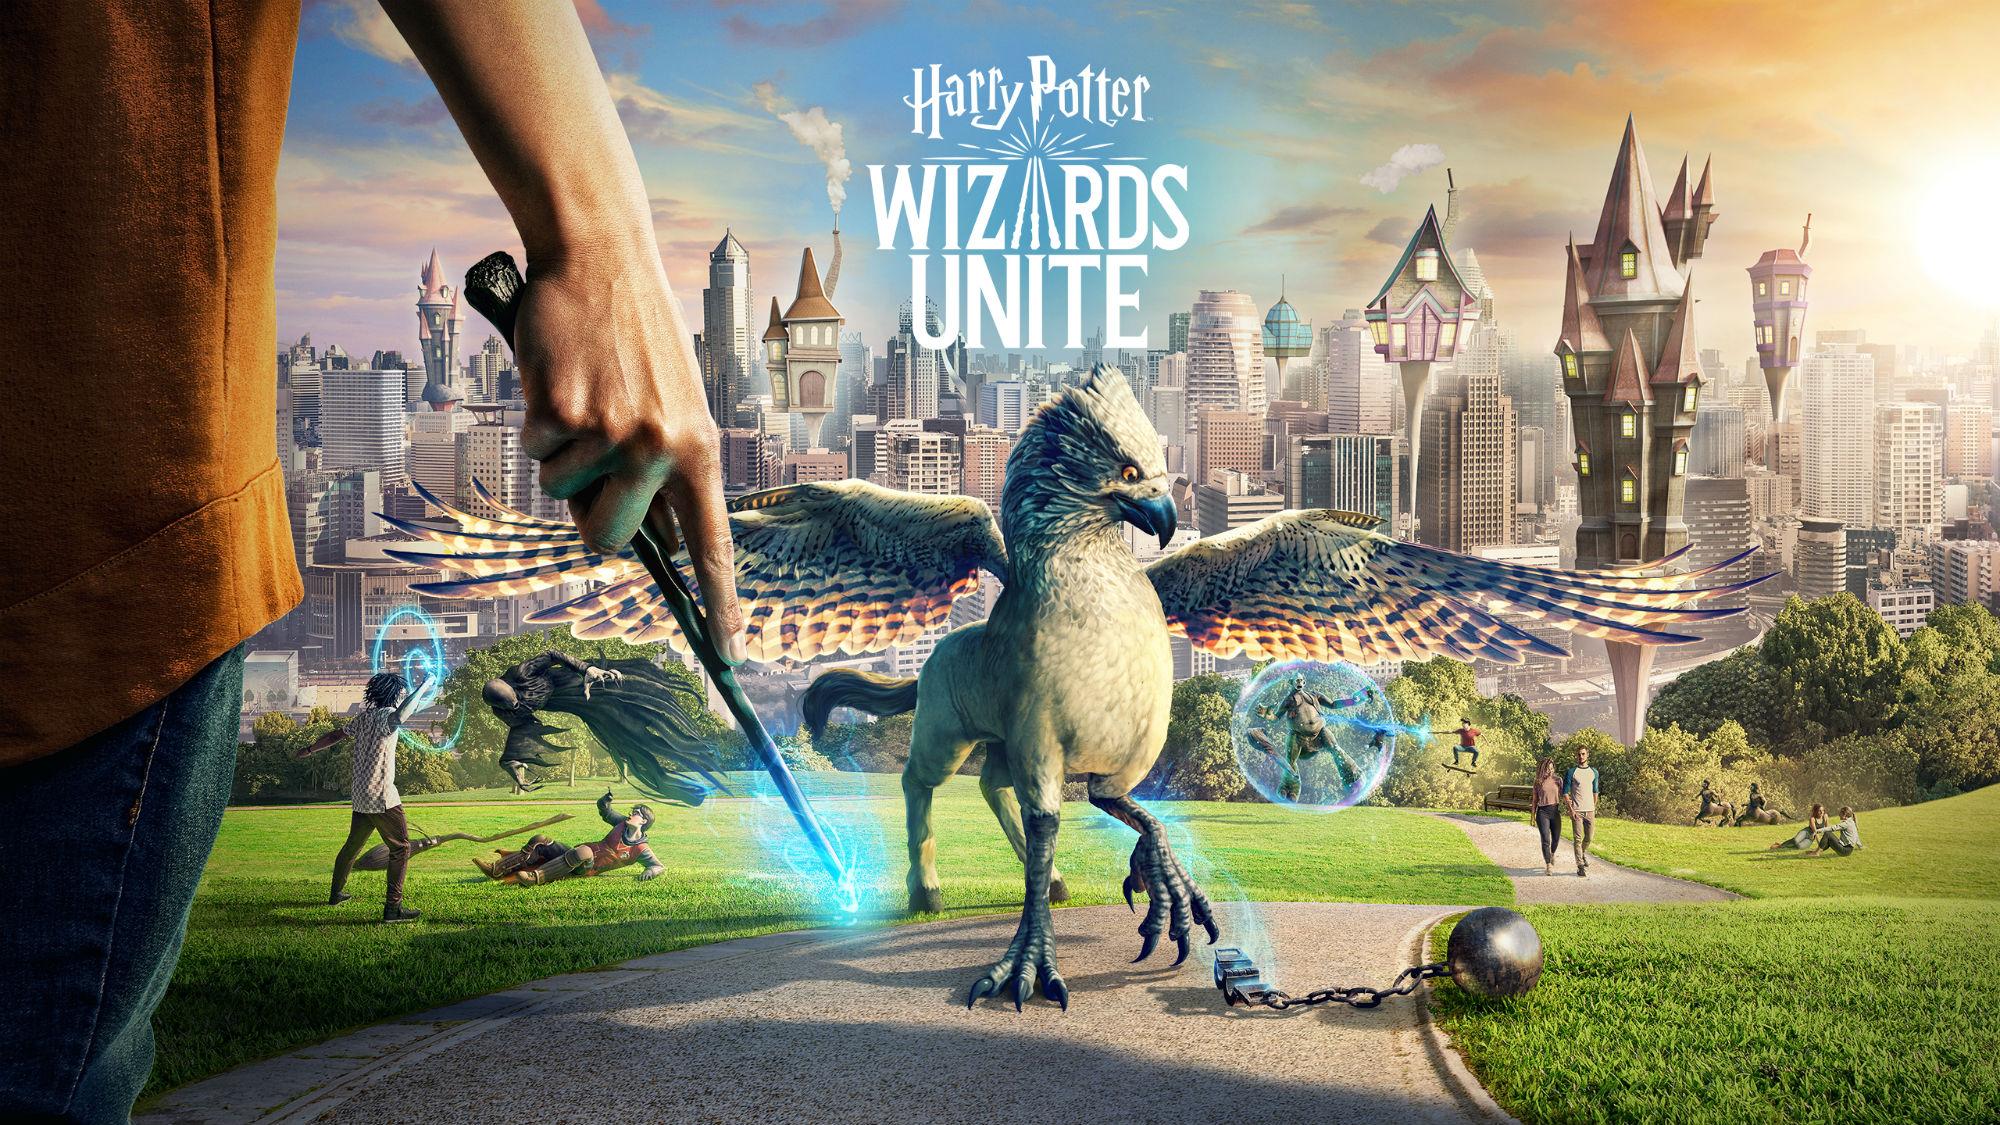 Harr Potter Wizard Unite - KeyArt